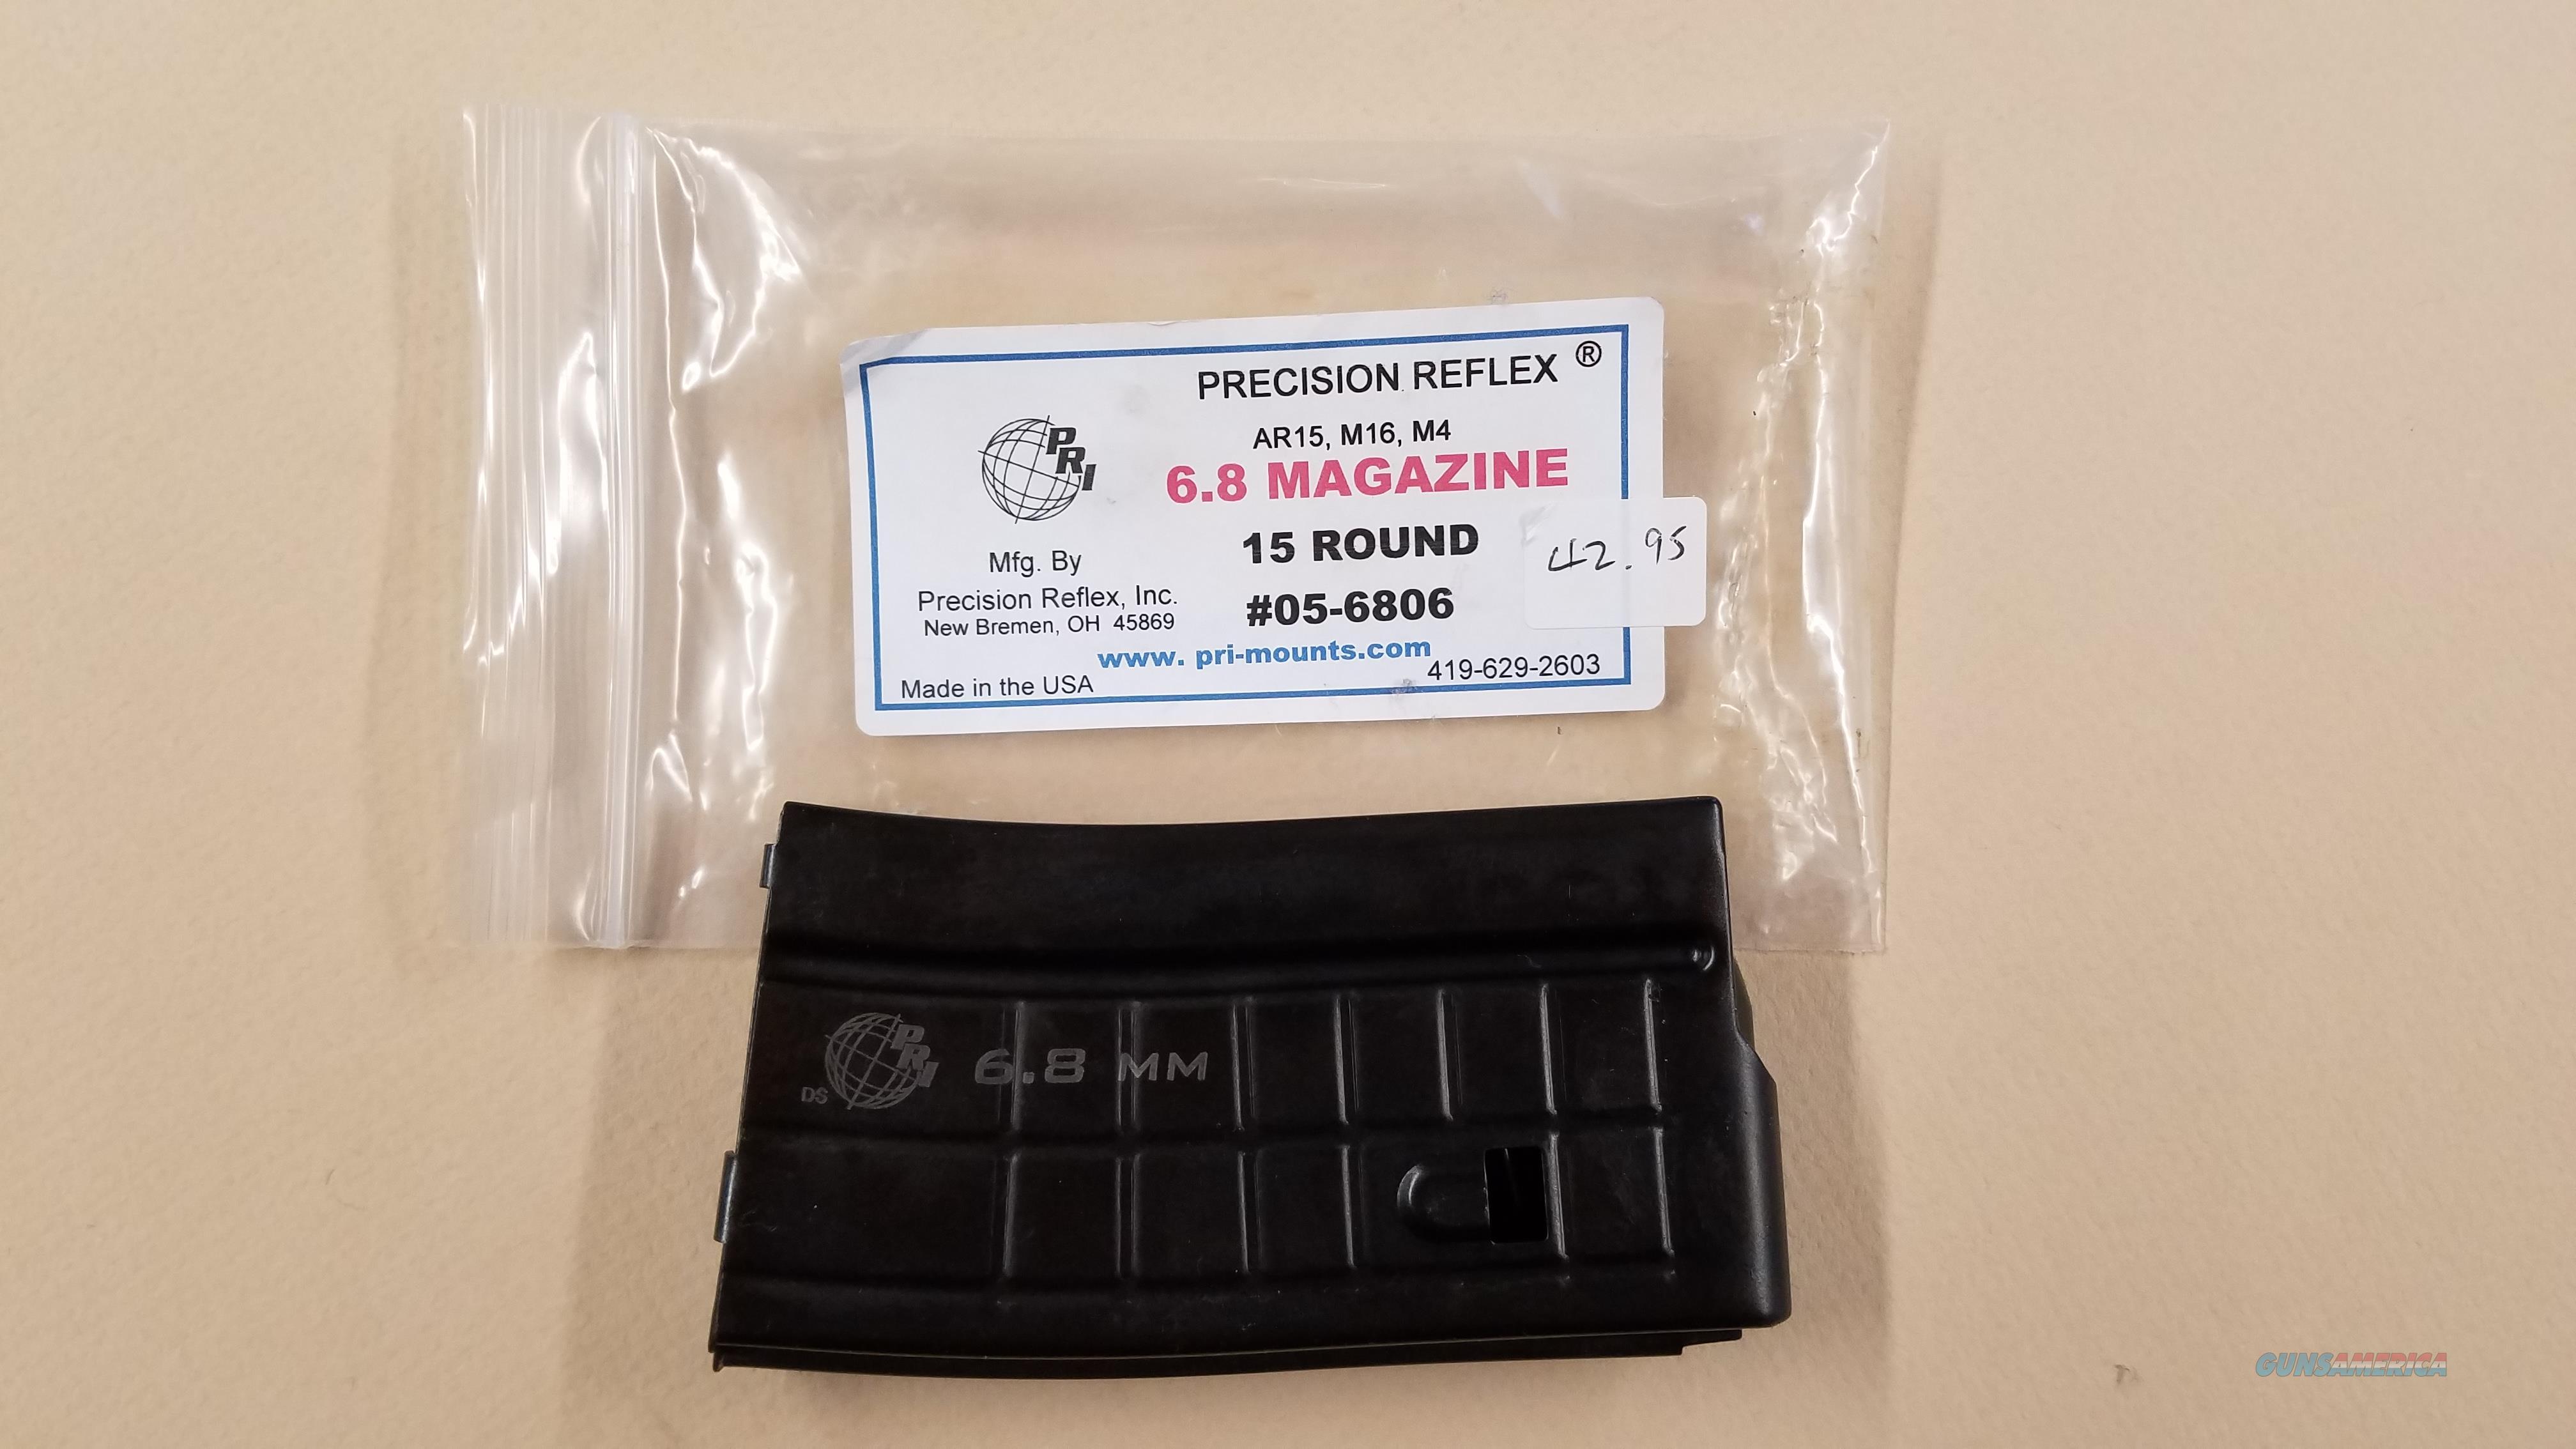 PRECISION RELEX 6.8 15 ROUND MAGAZINE  Non-Guns > Magazines & Clips > Rifle Magazines > AR-15 Type